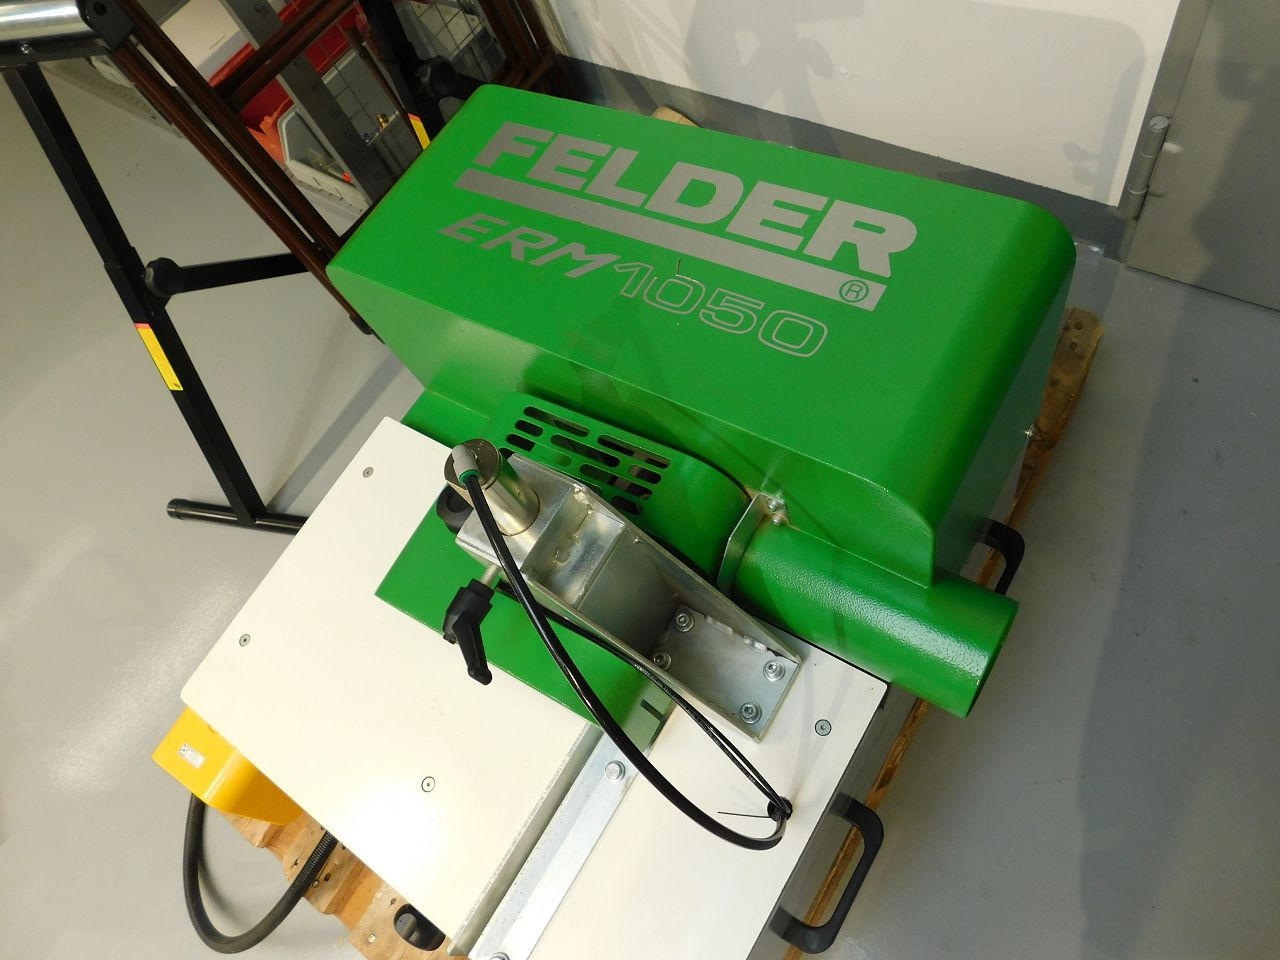 Eckenkopiermaschine ERM 1050 Felder  4 .JPGEckenkopiermaschine ERM 1050 Felder  4